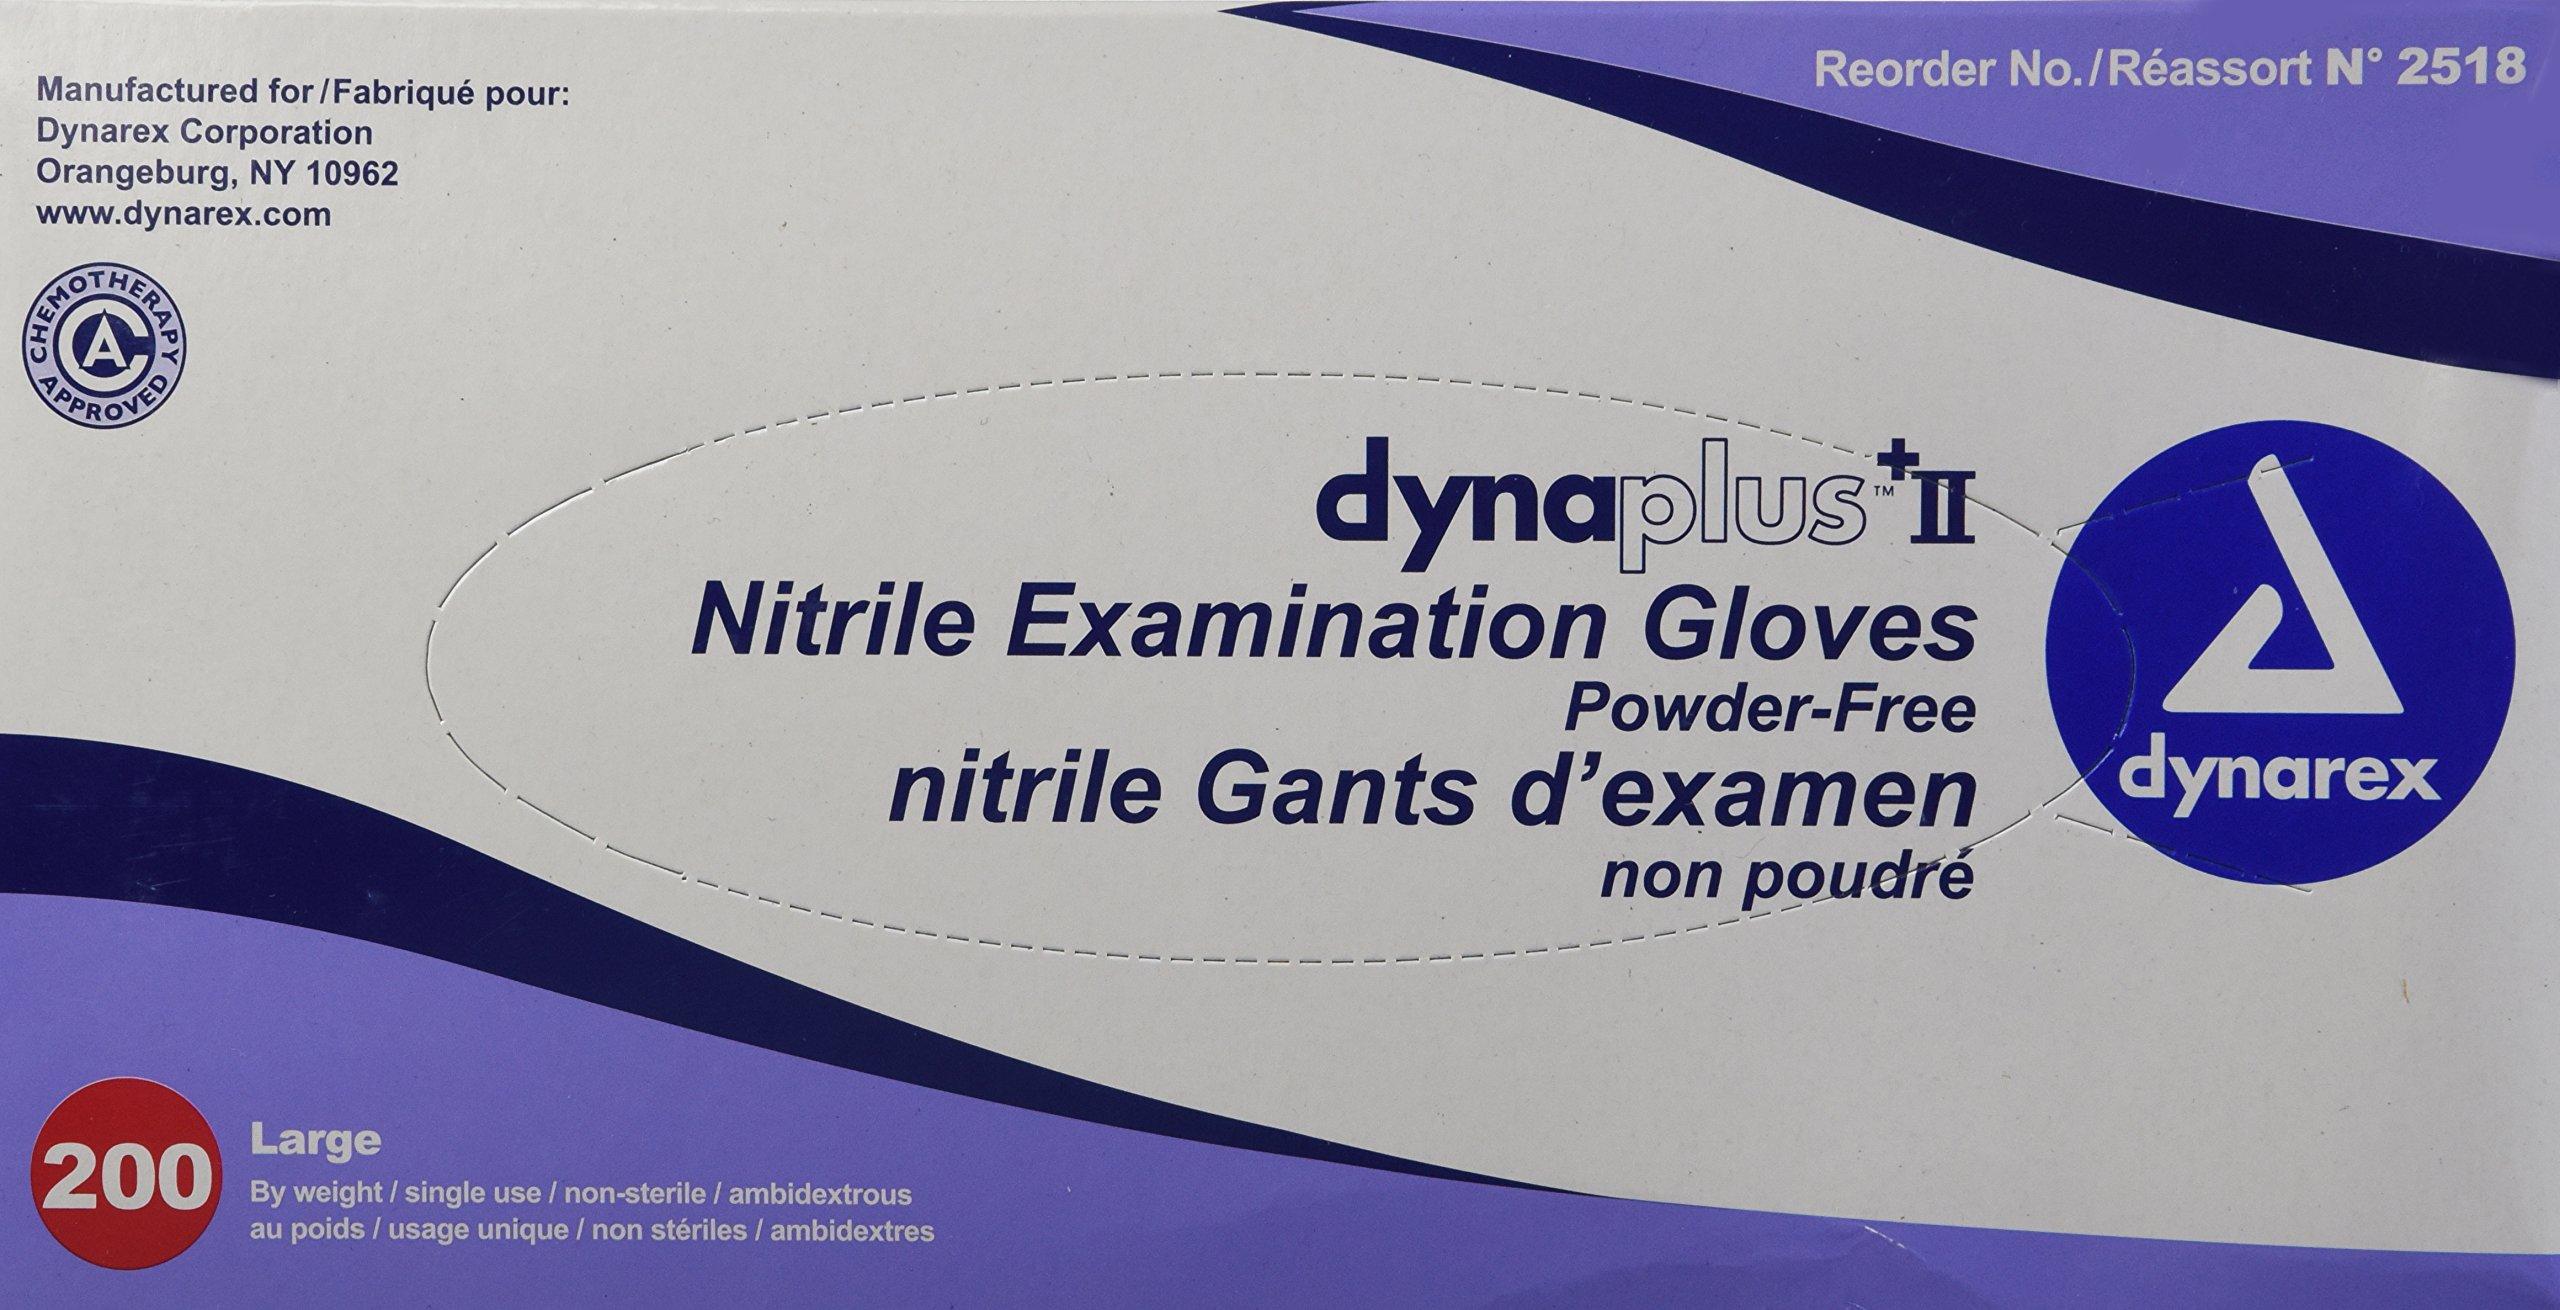 Dynarex Dynaplus Economy Nitrile Gloves, Large, 200 Count